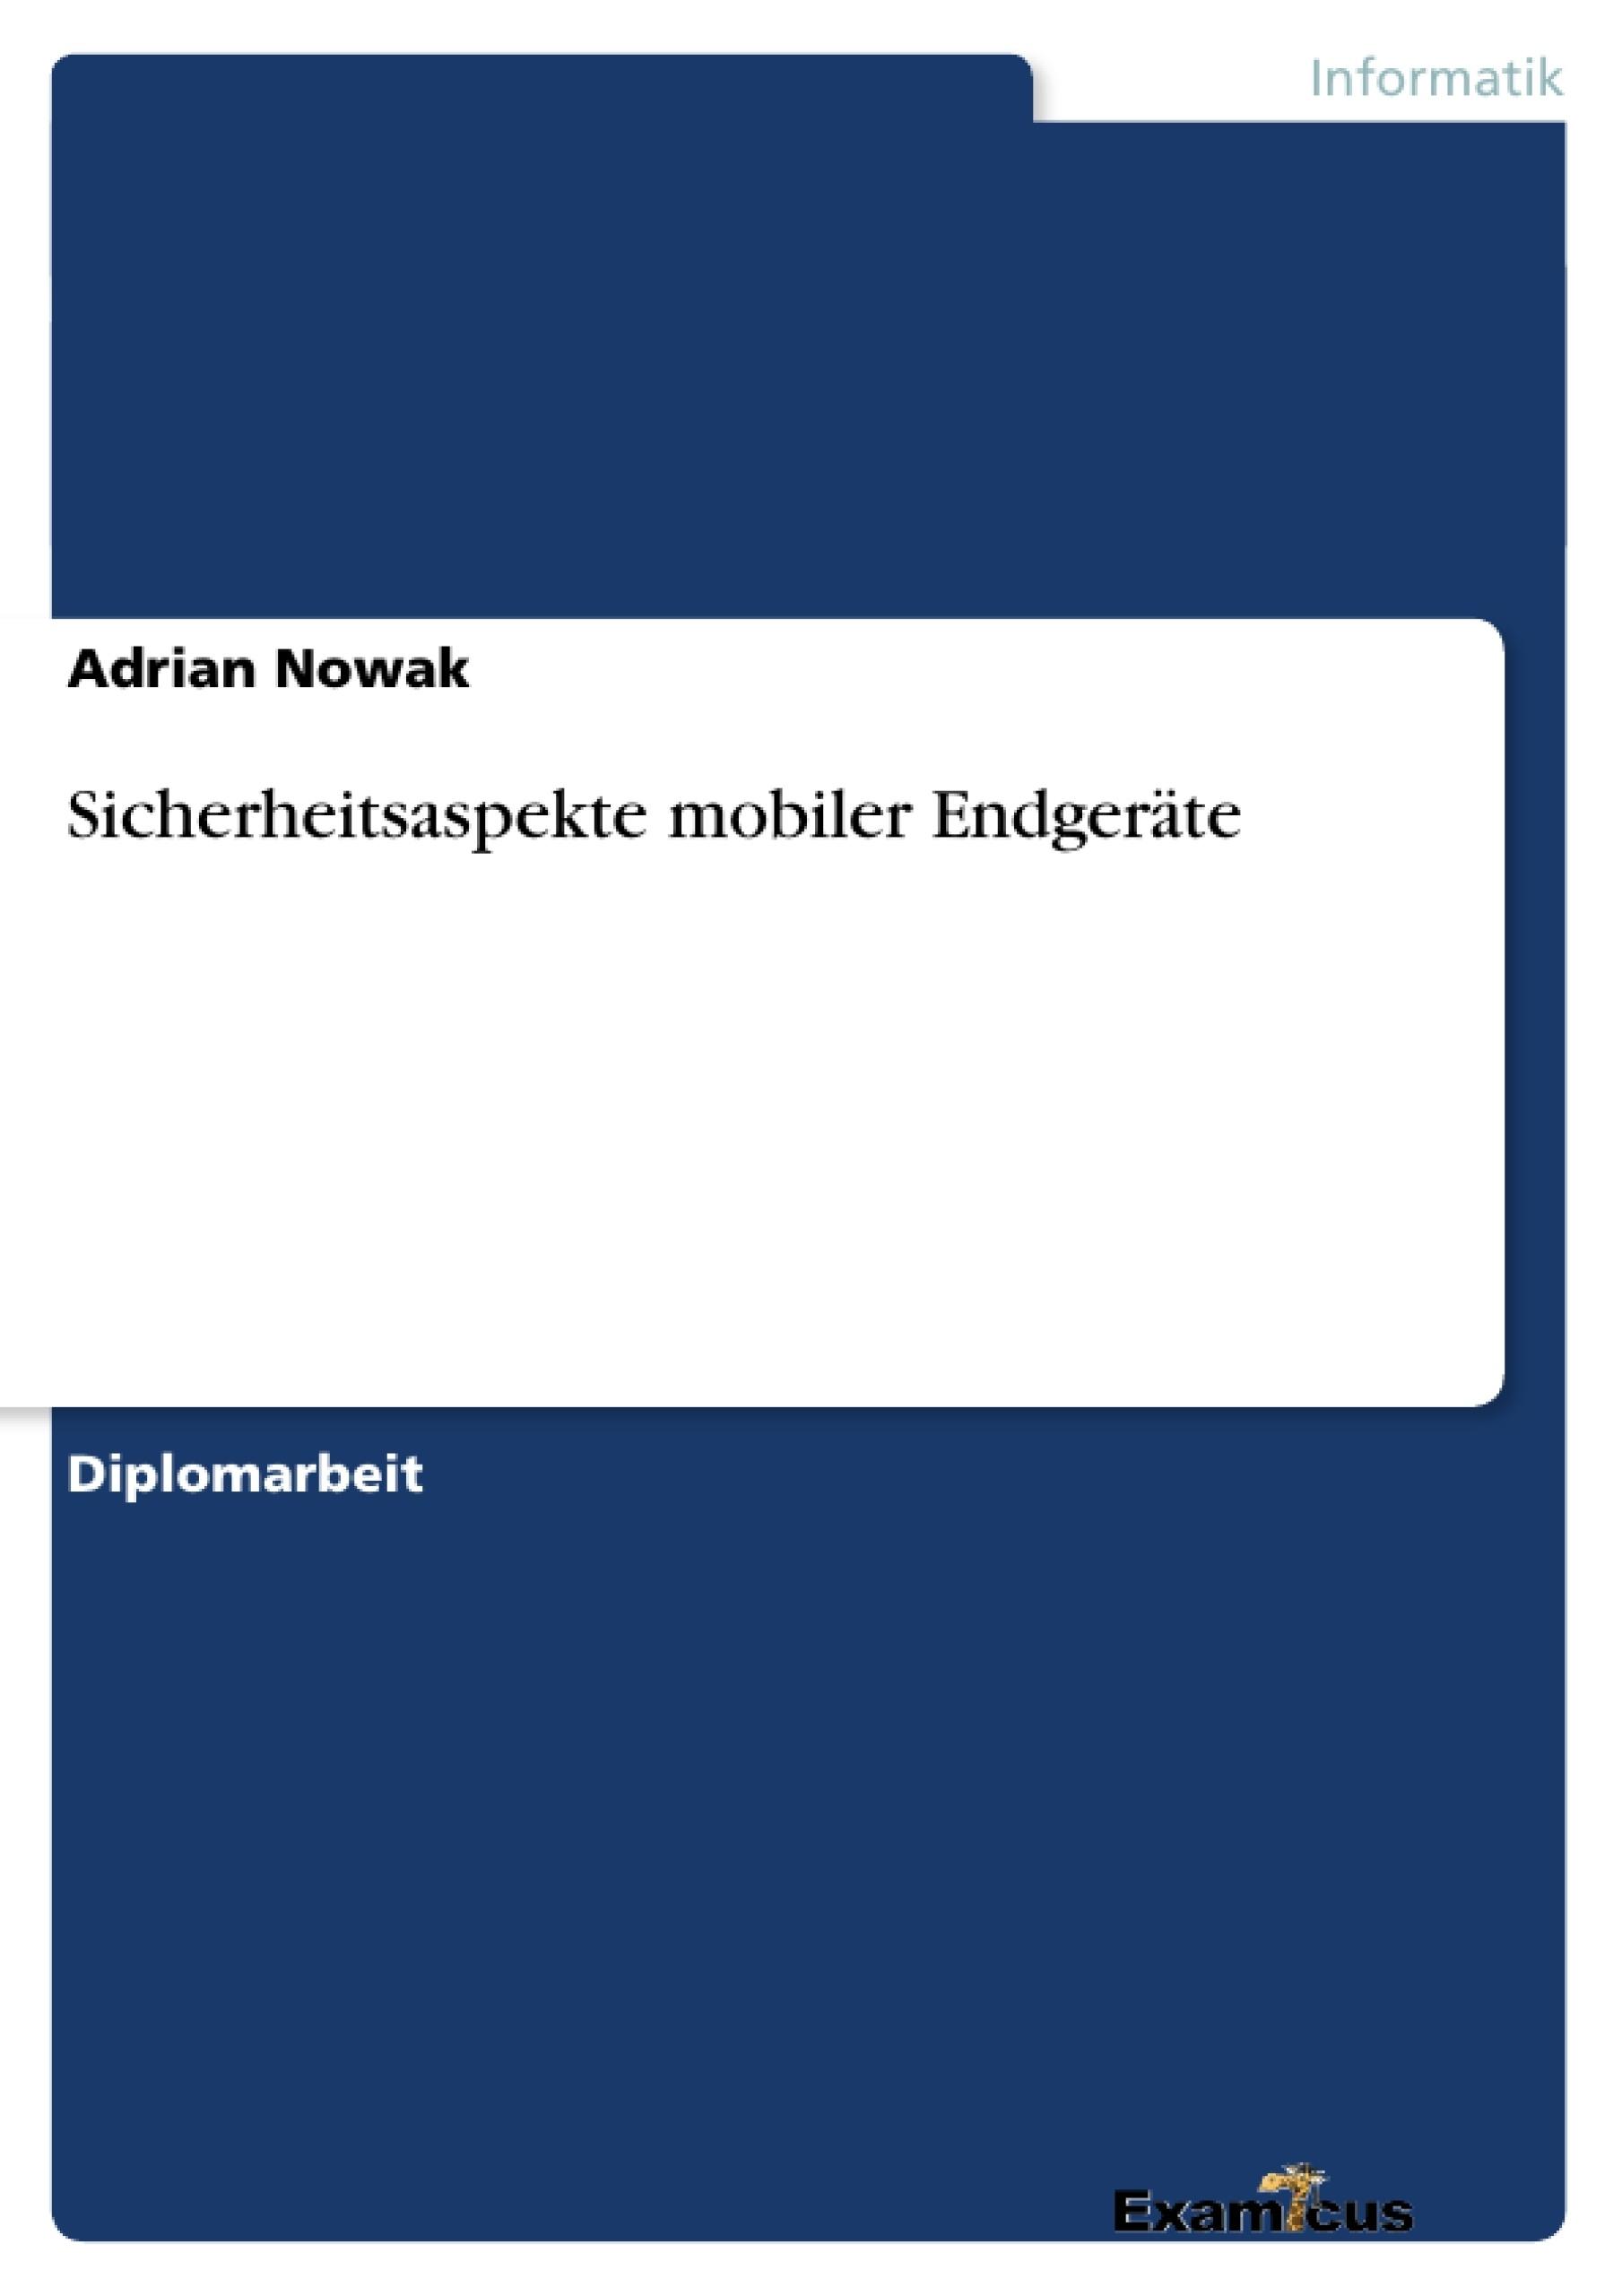 Titel: Sicherheitsaspekte mobiler Endgeräte